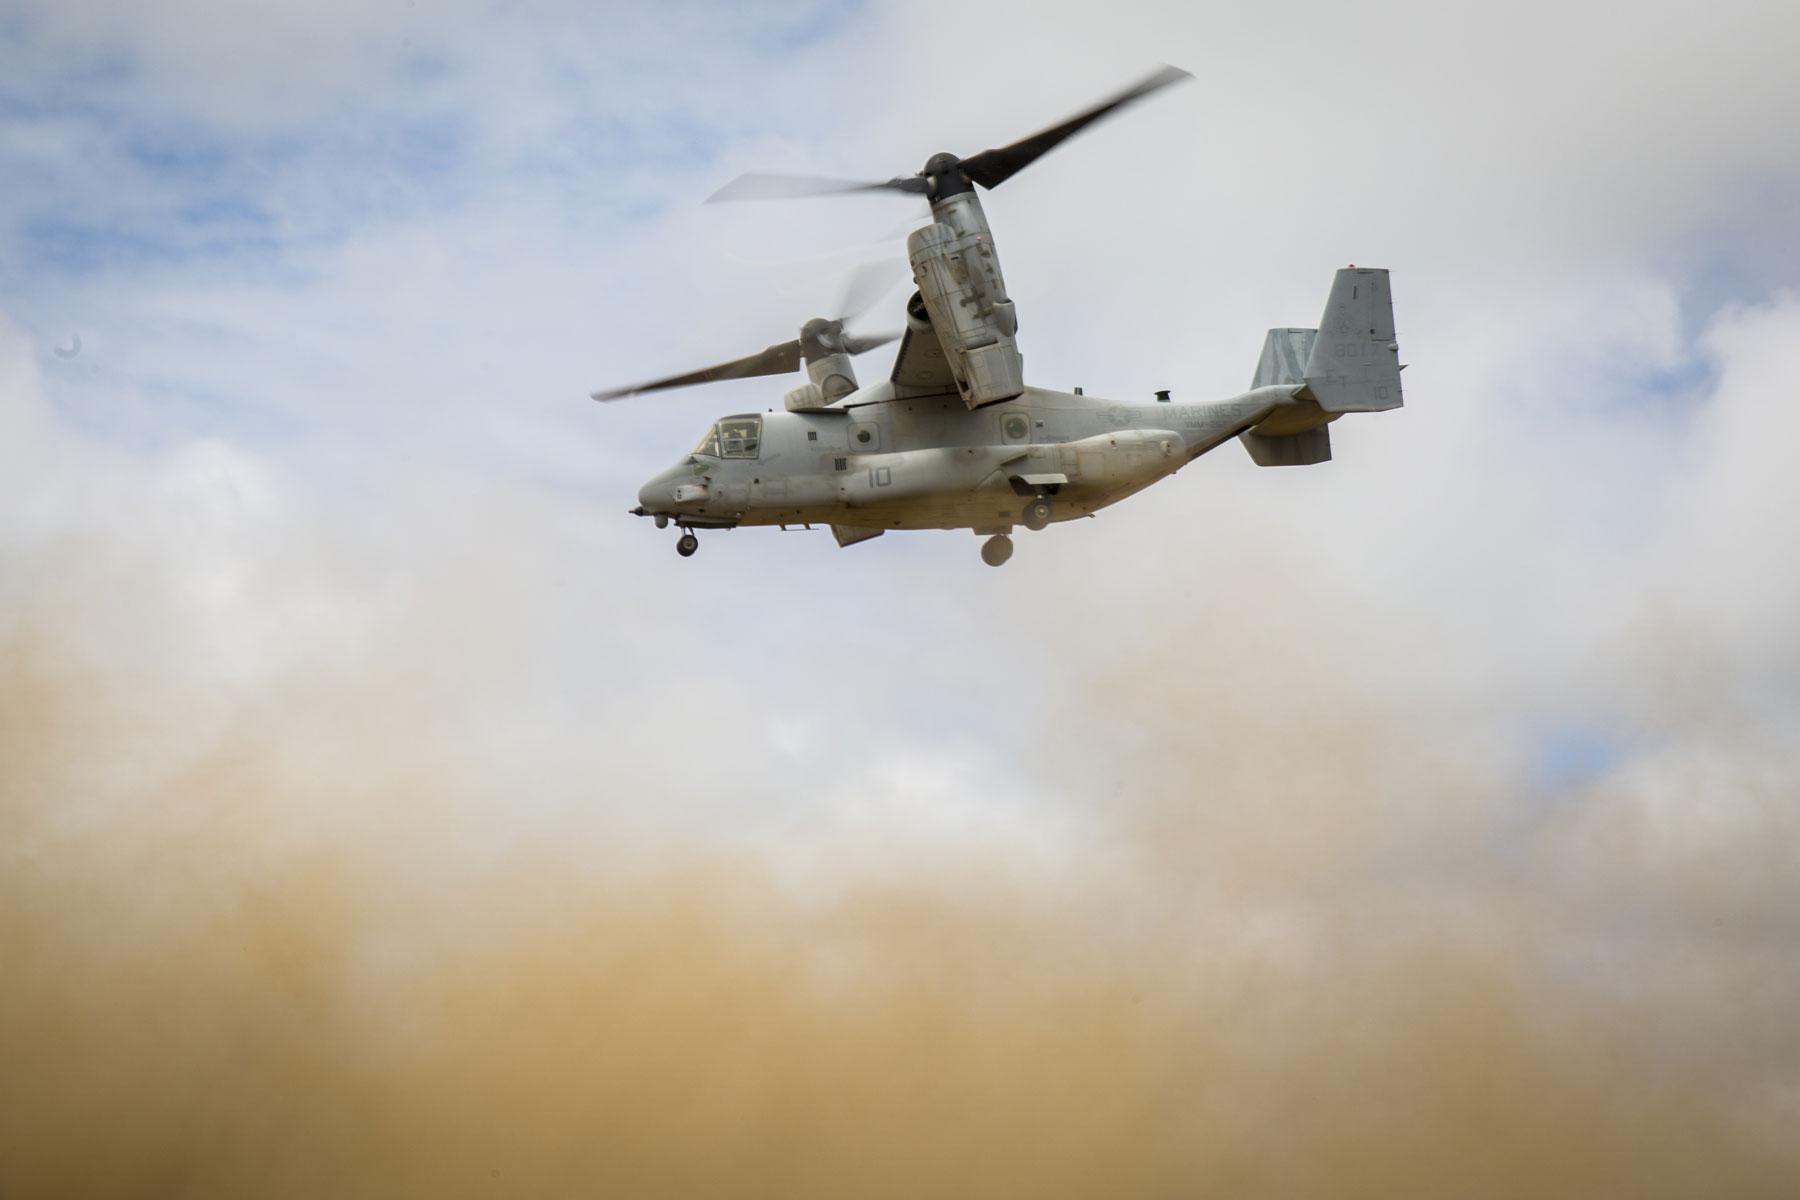 2 Troops Injured In Non Combat V 22 Crash In Syria